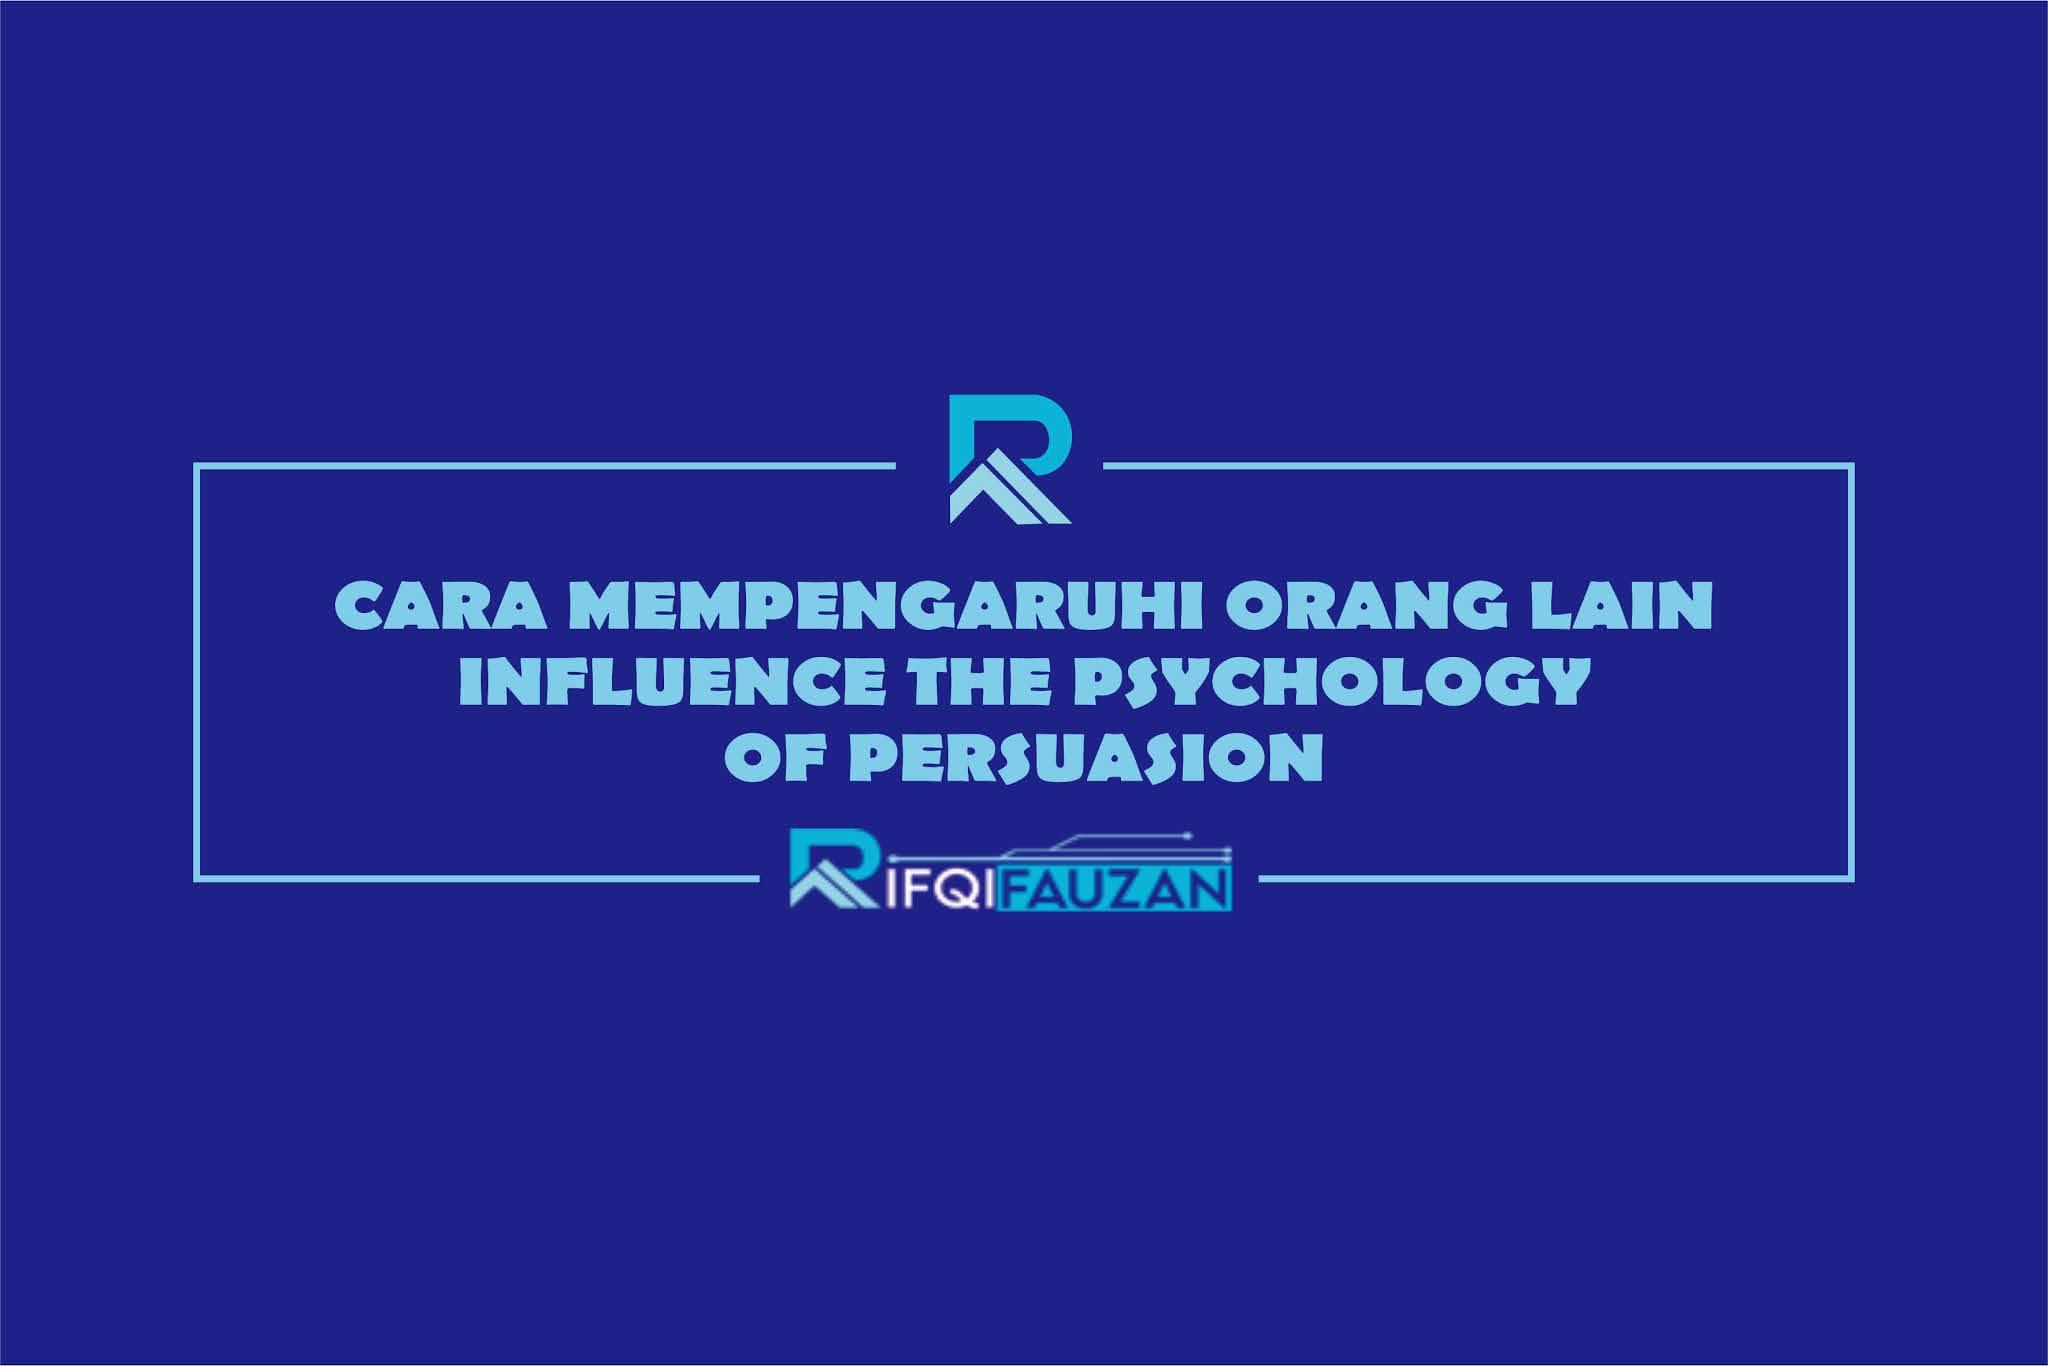 CARA MEMPENGARUHI ORANG LAIN | INFLUENCE THE PSYCHOLOGY OF PERSUASION